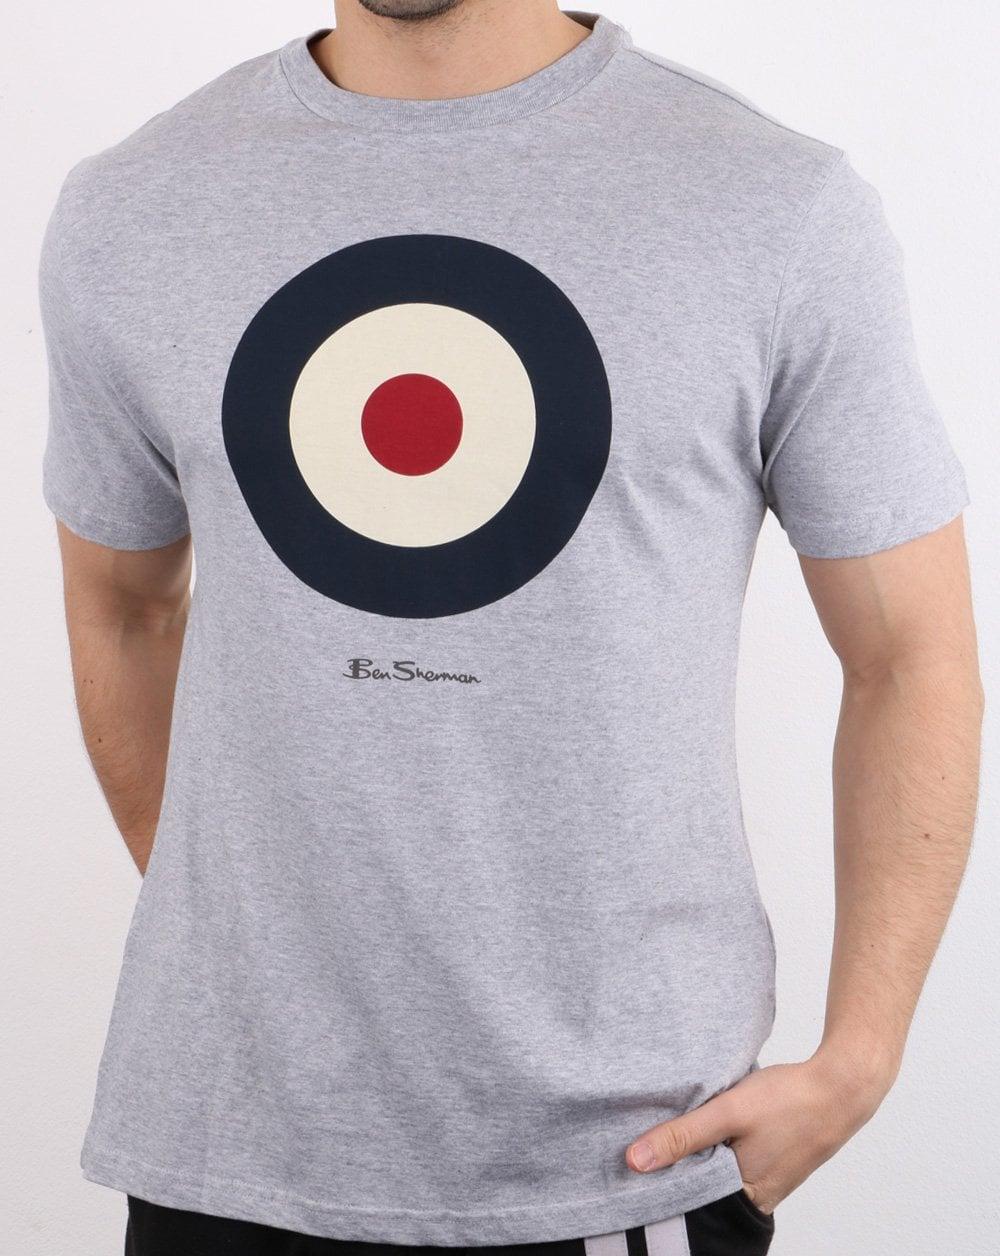 procedimiento Sospechar Sinceramente  Ben Sherman Target T Shirt in Grey | 80s Casual Classics